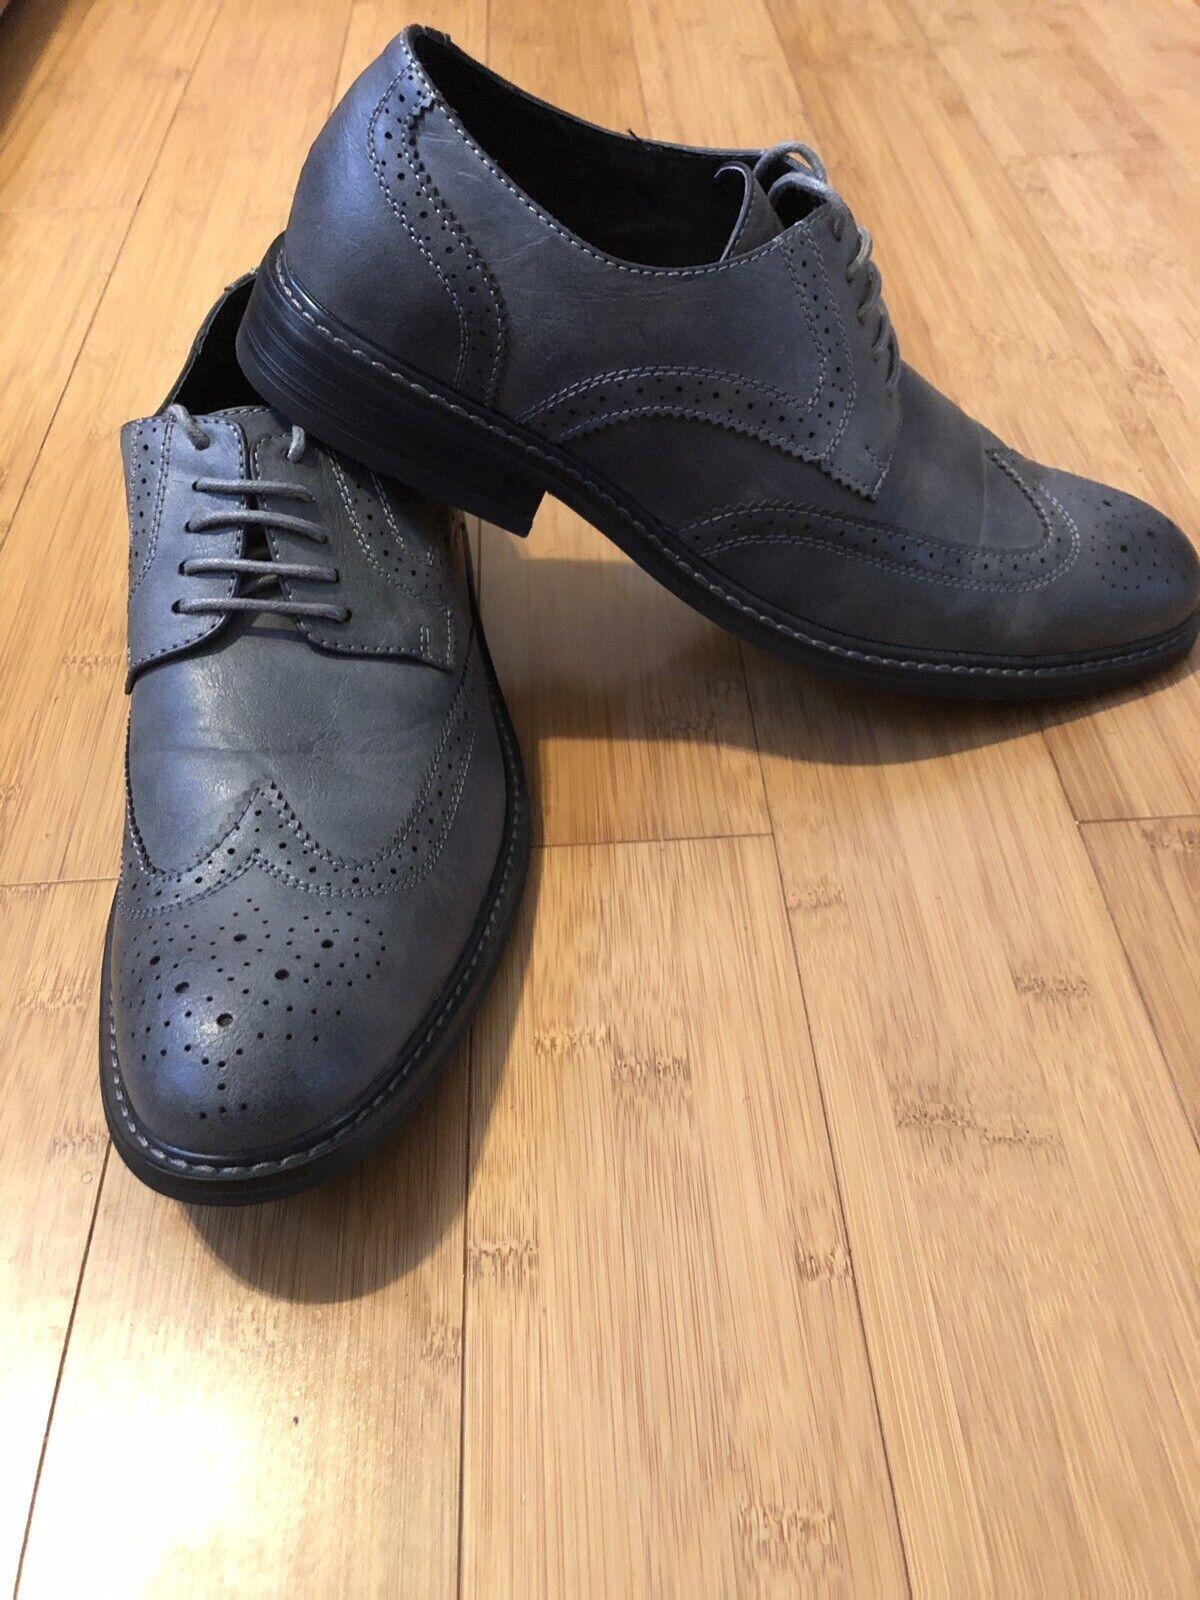 perry ellis portfolio shoes - image 5